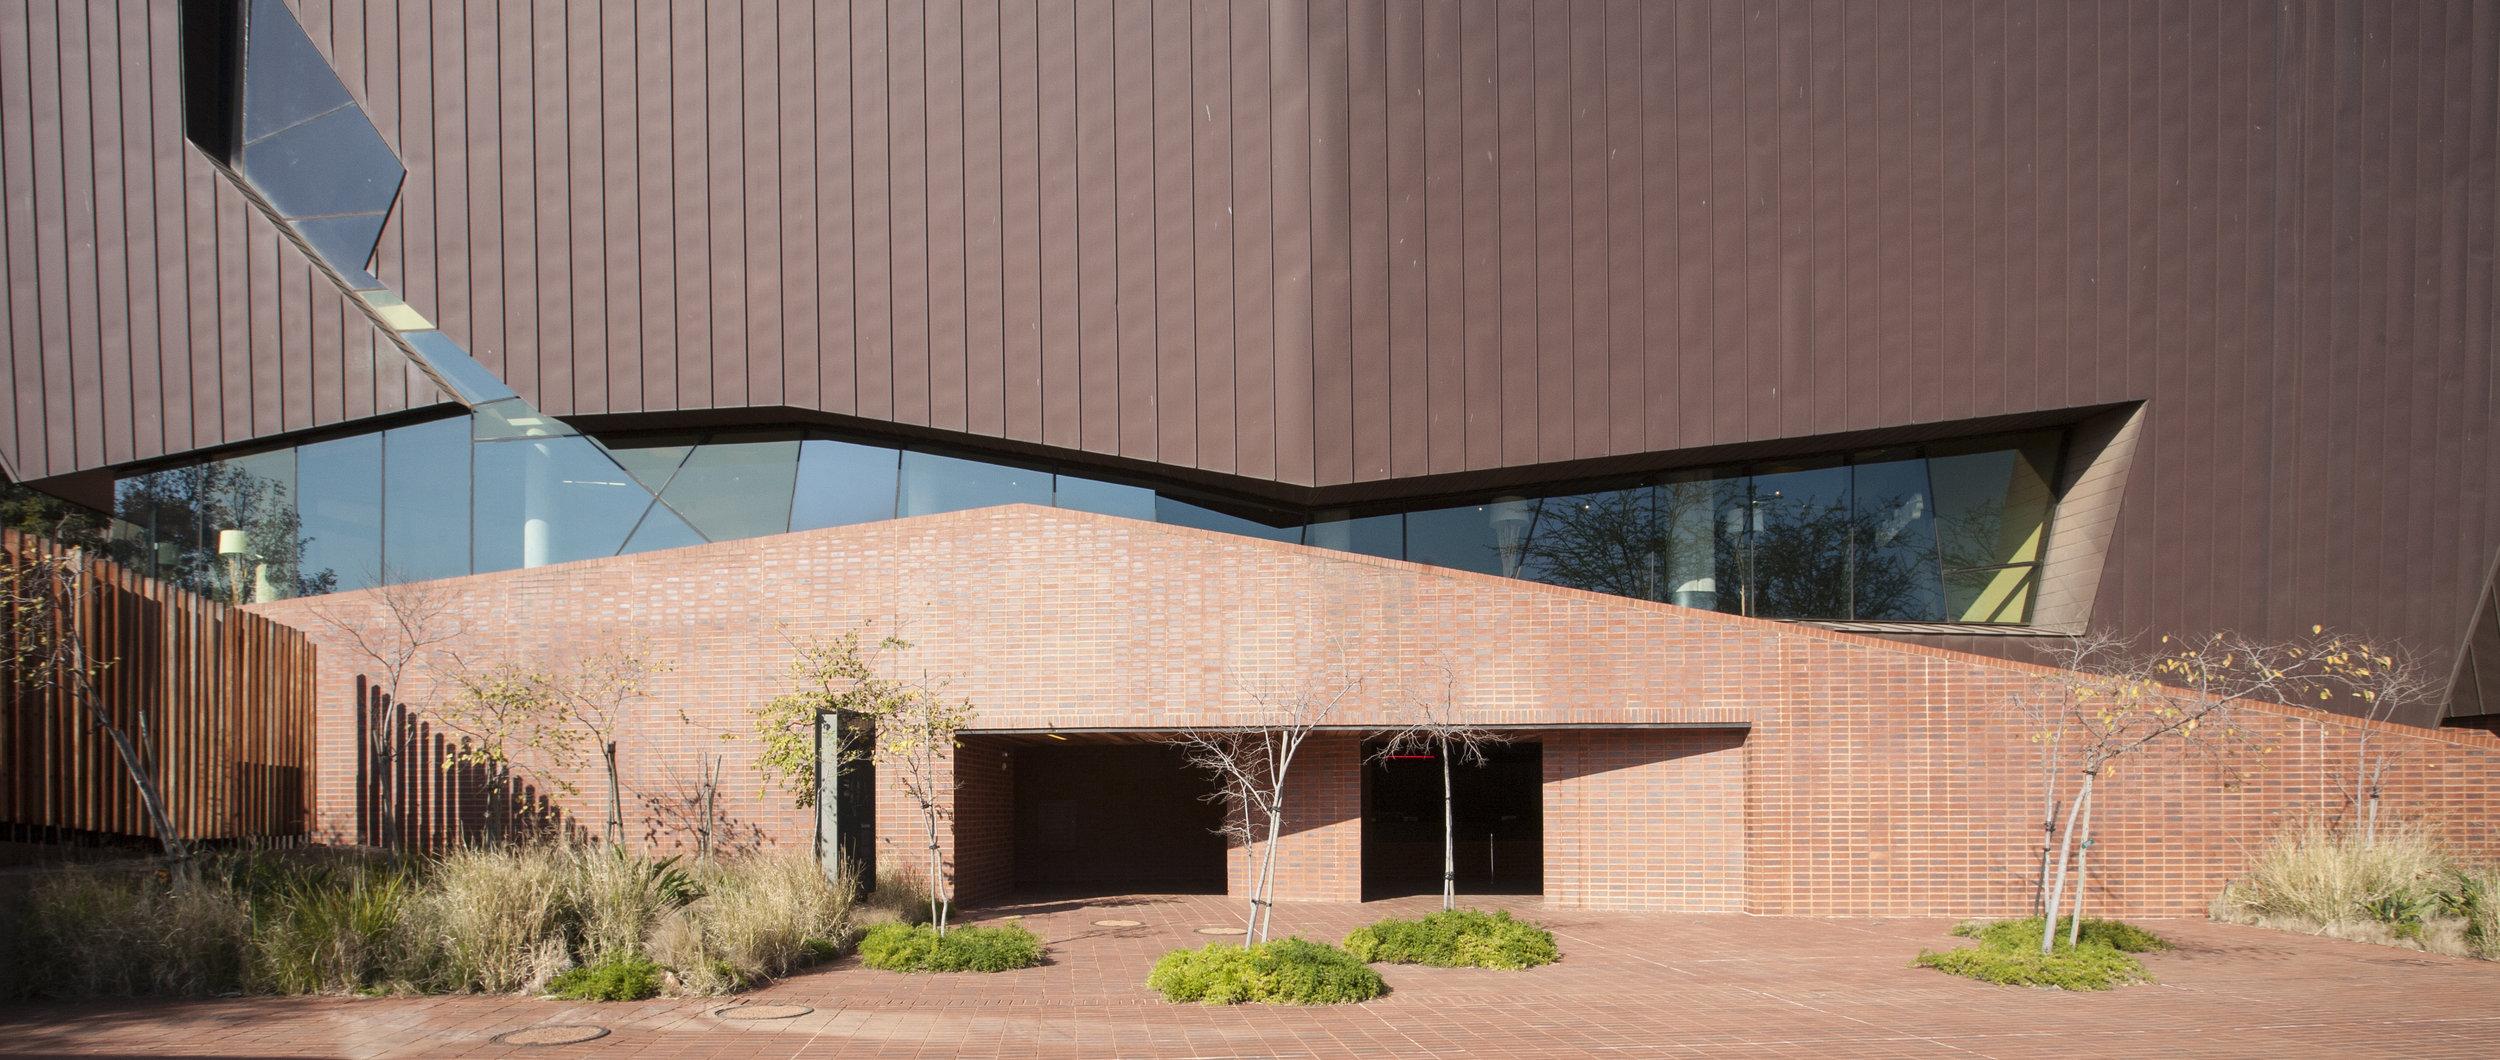 Freedom Park Museum